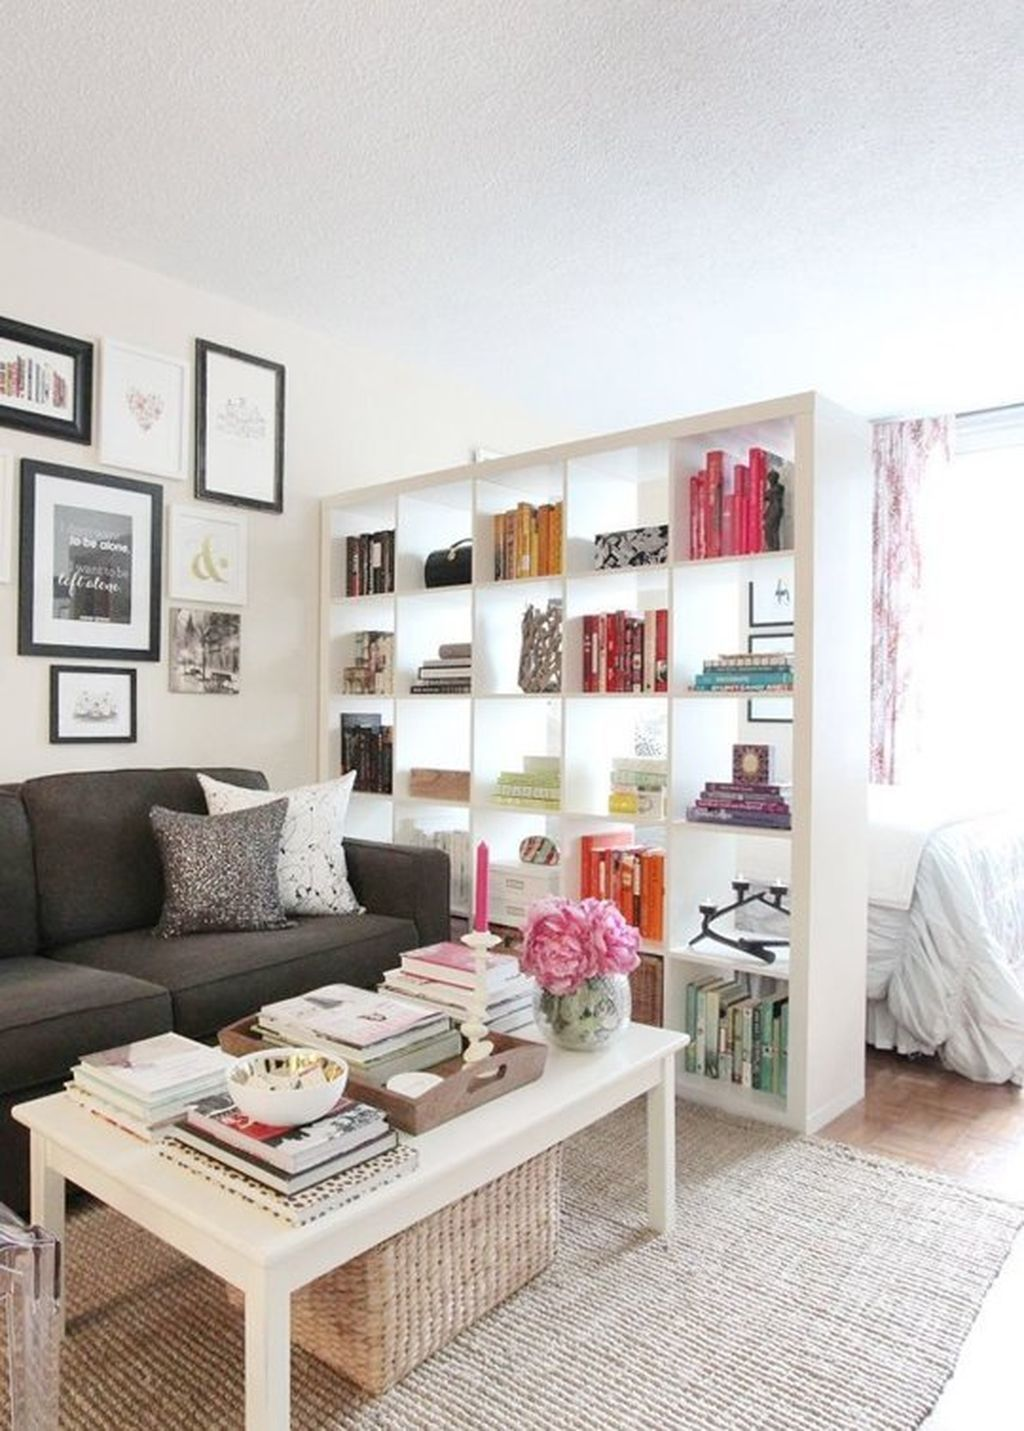 60 Space Saving Small Studio Decoration Ideas | Pinterest | Small ...